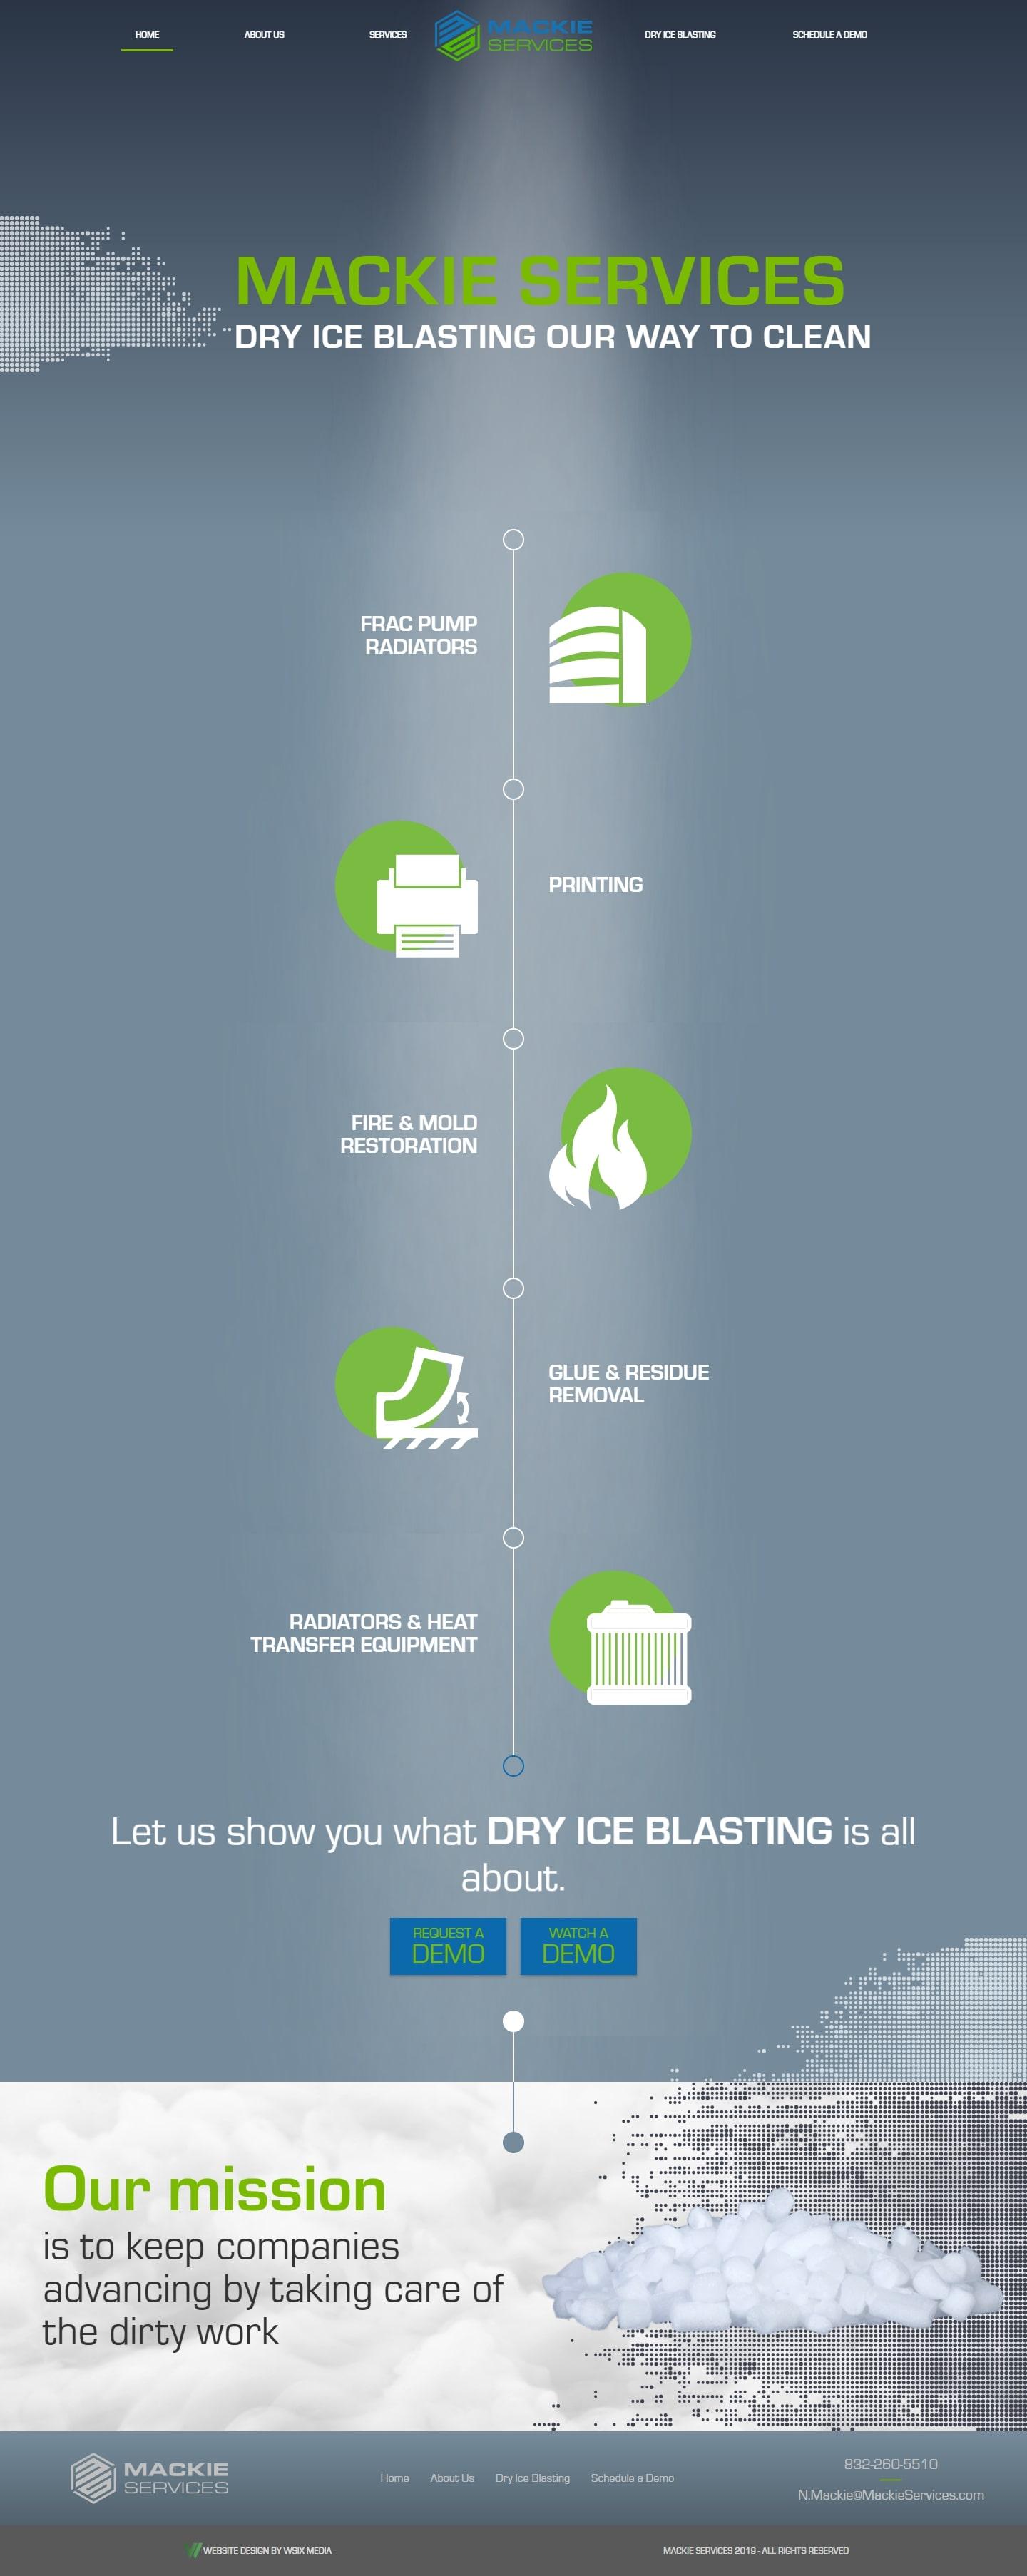 Bigotes The Woodlands Web Design Page